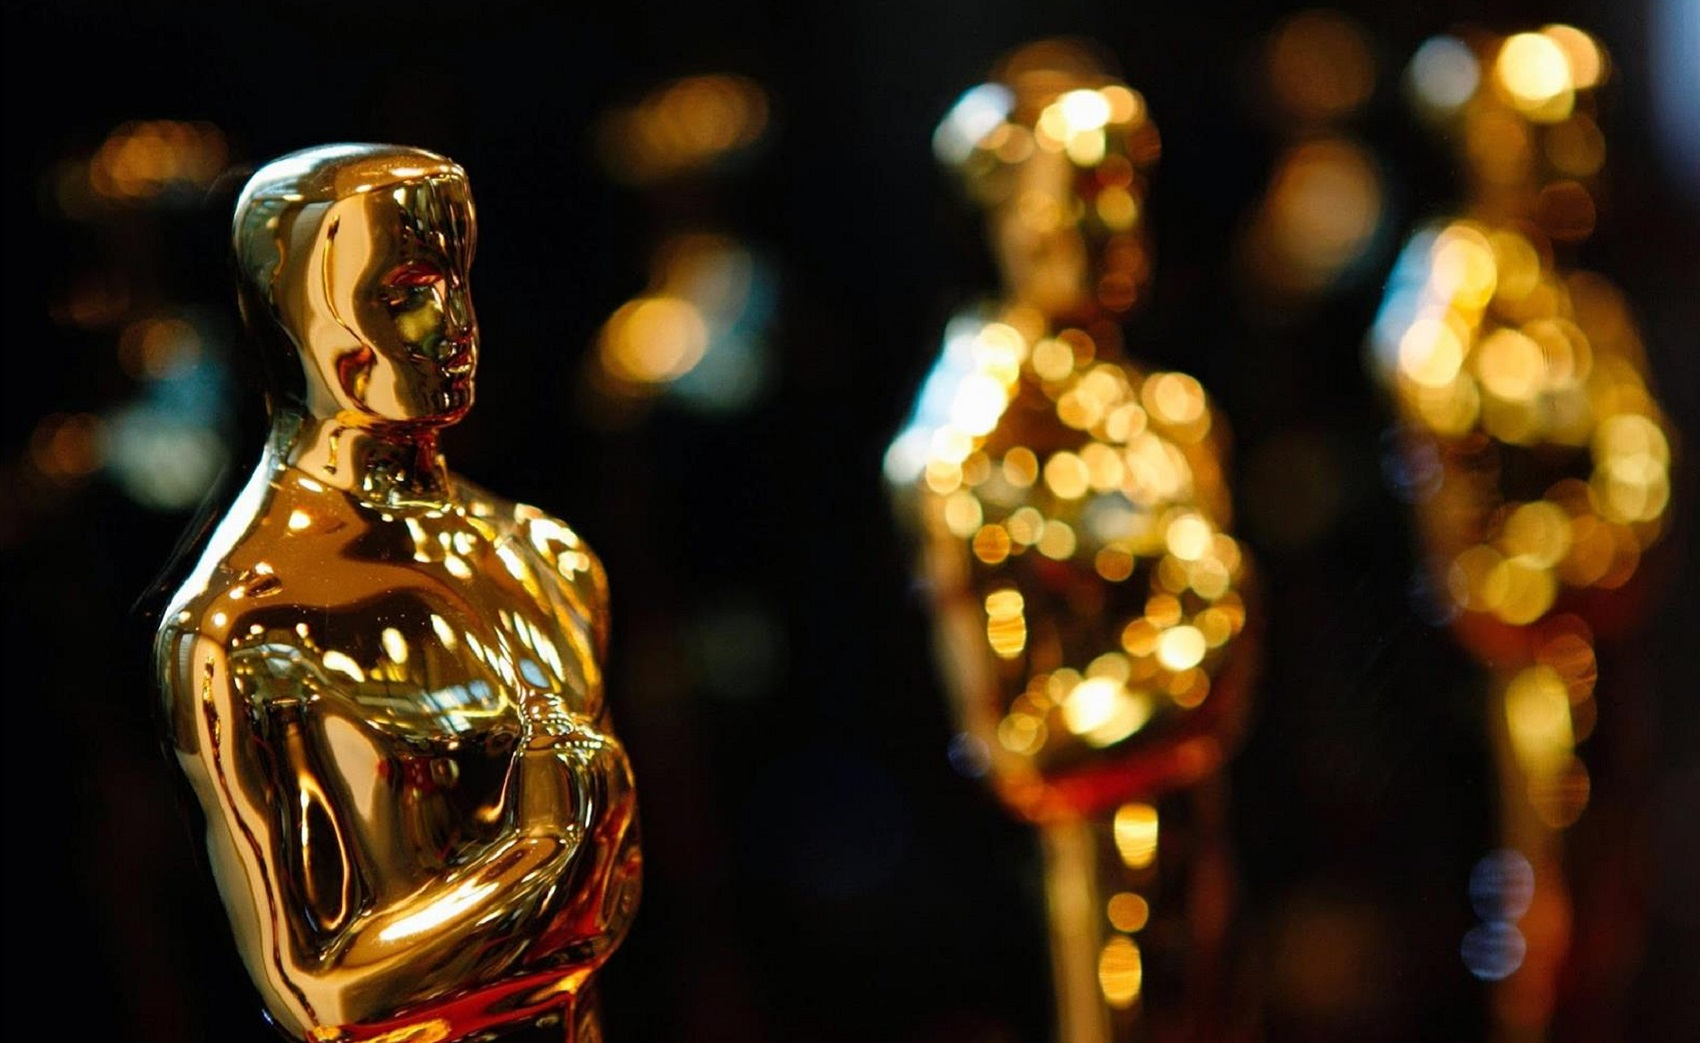 Oscar 2016: L'aria che tira – #1